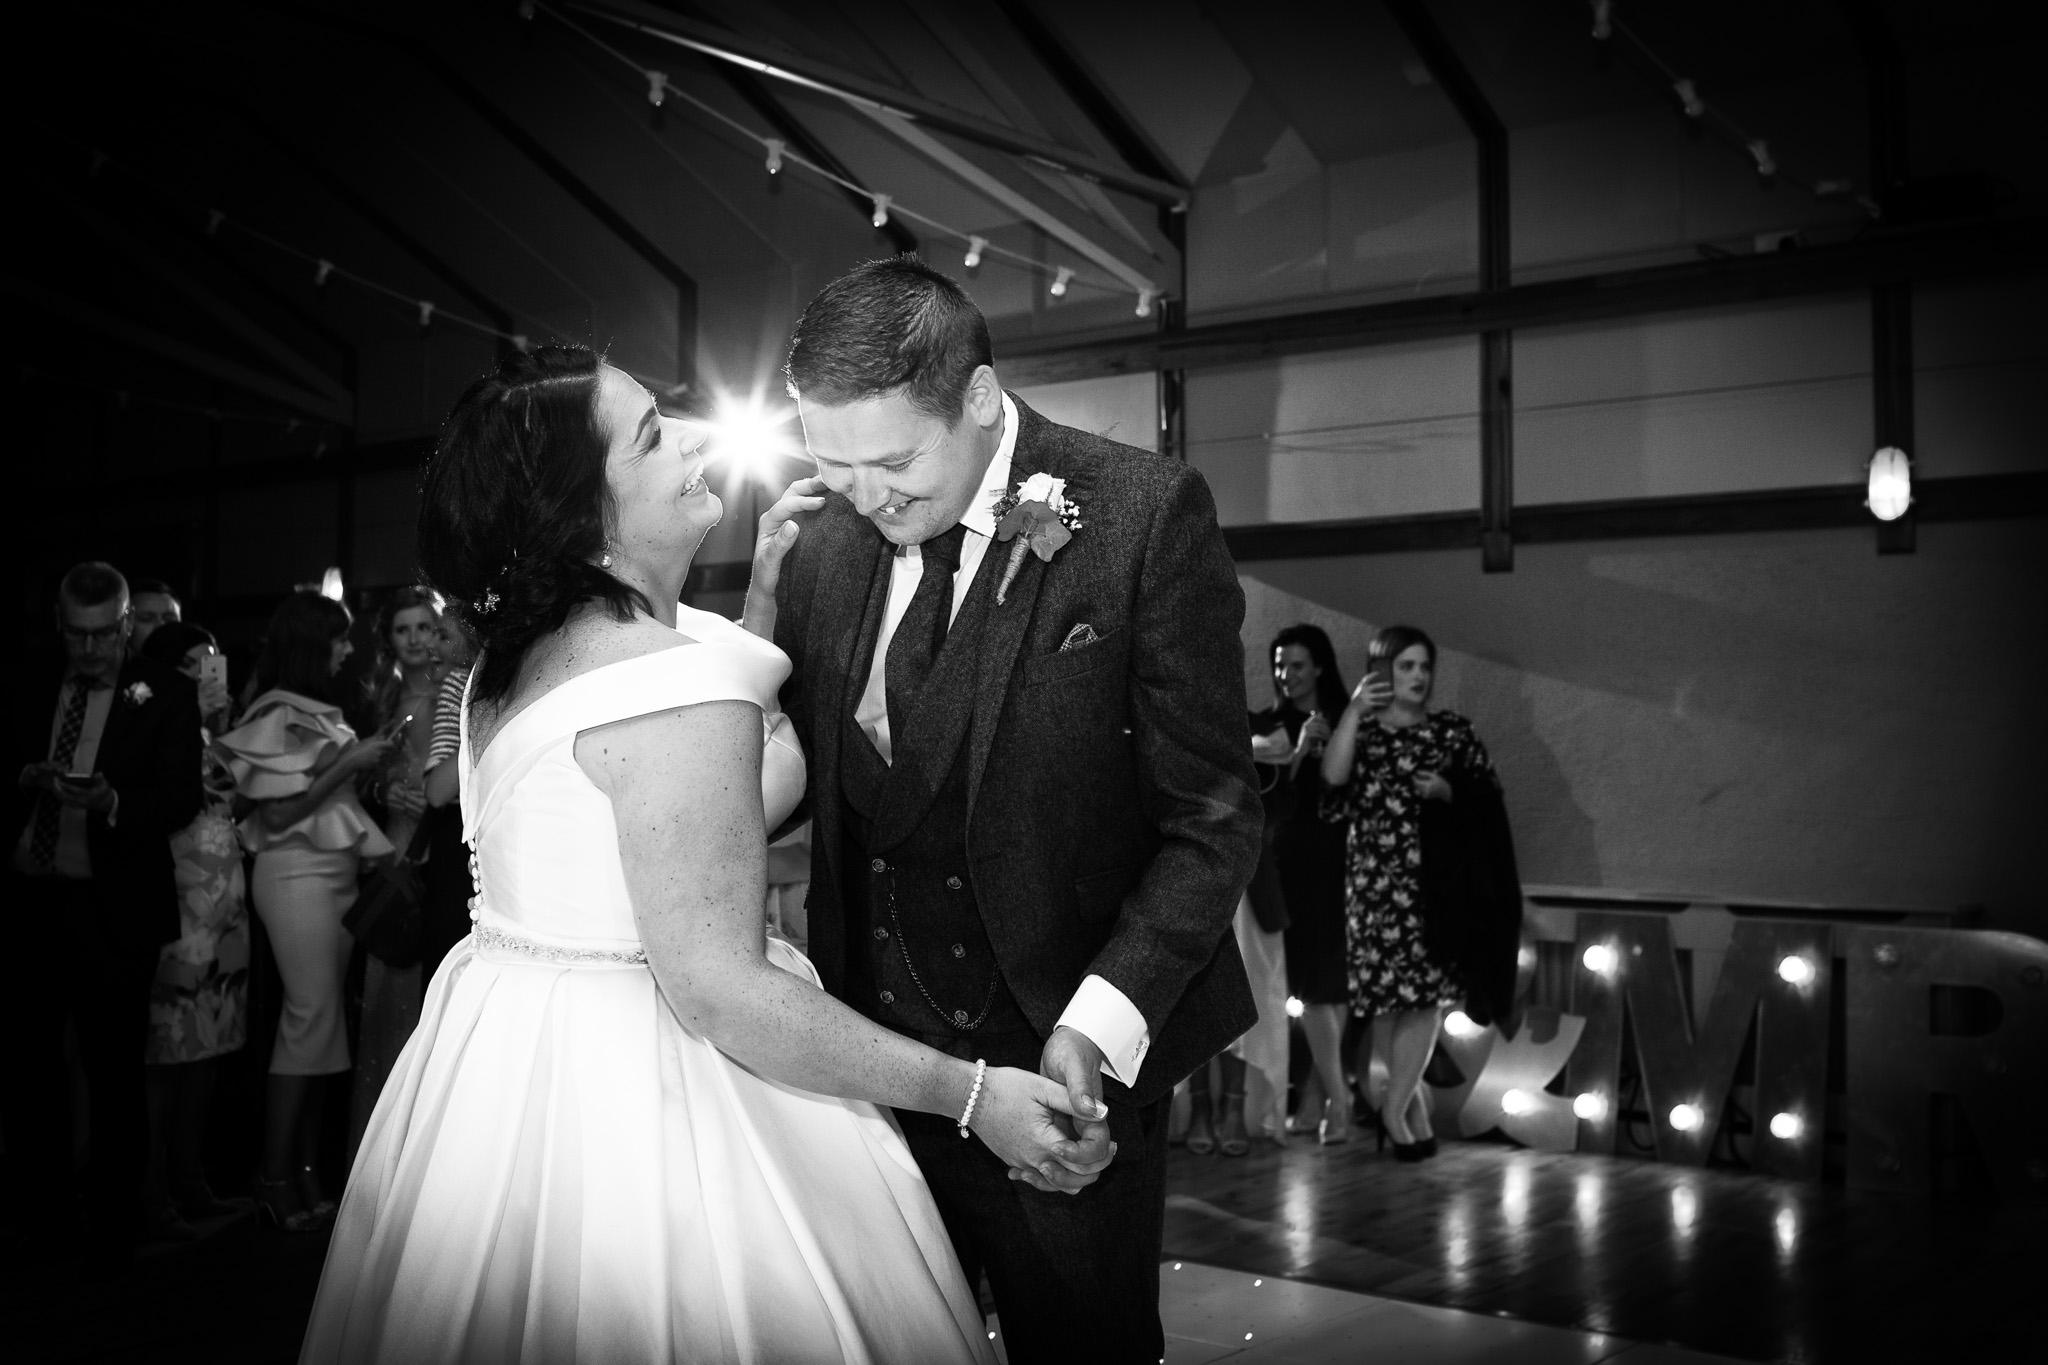 Mark_Barnes_Northern_Ireland_Wedding_Photography_Lusty_Beg_Wedding_Photography_Hayley&Brian-43.jpg